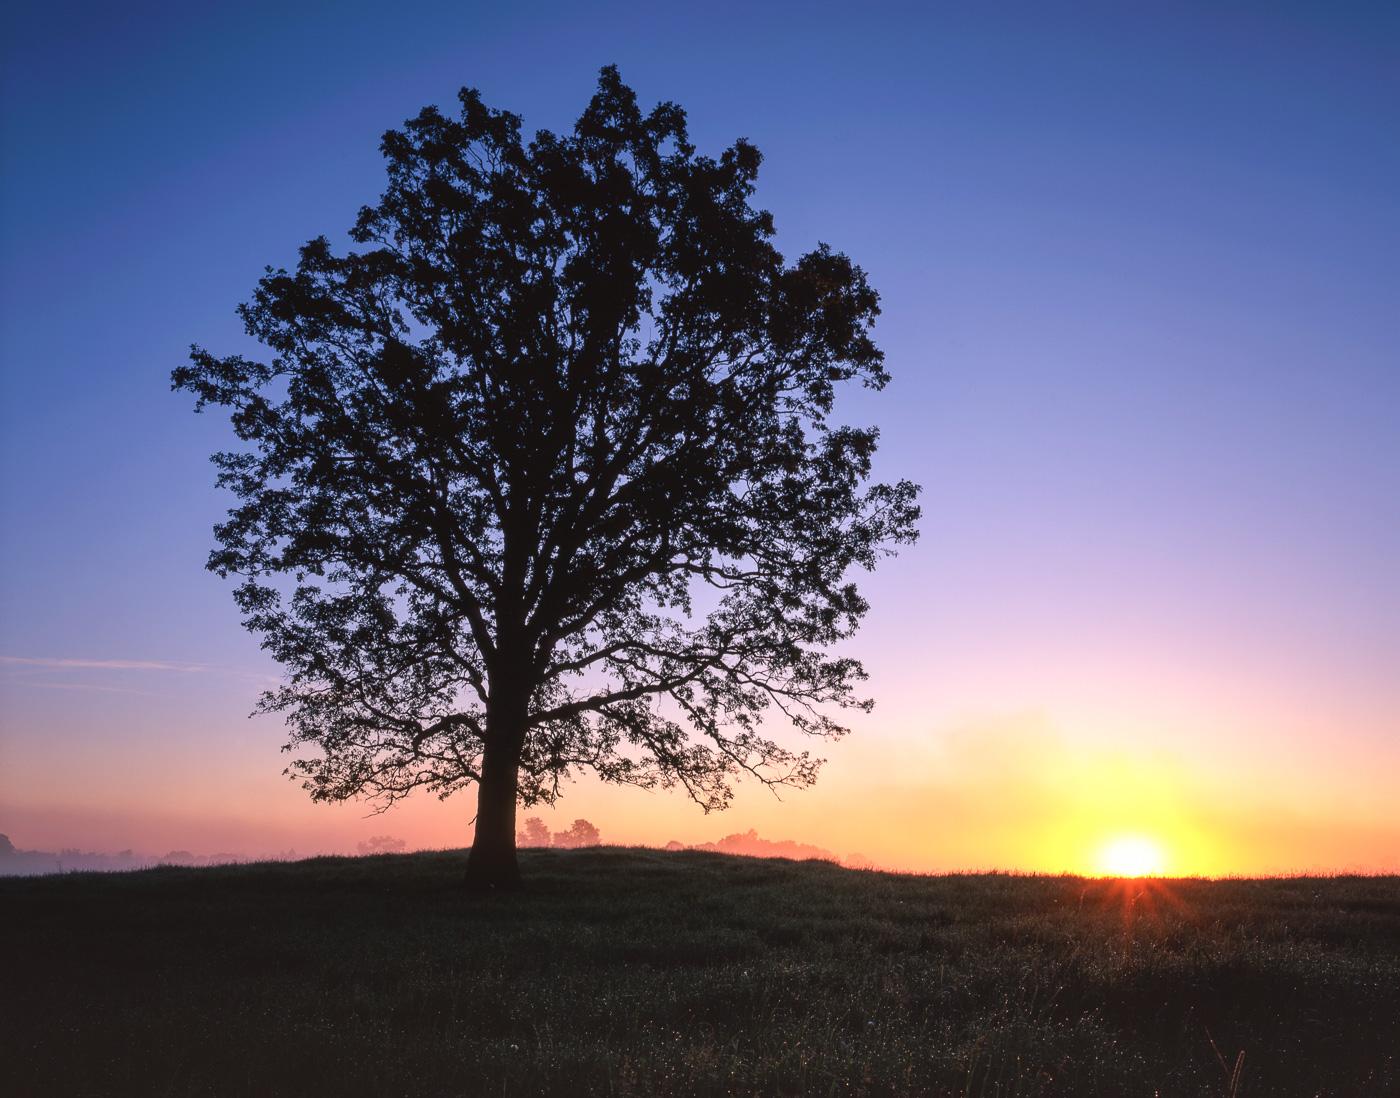 Rising sun and ground fog silhouetting an oak savannah in Central Minnesota